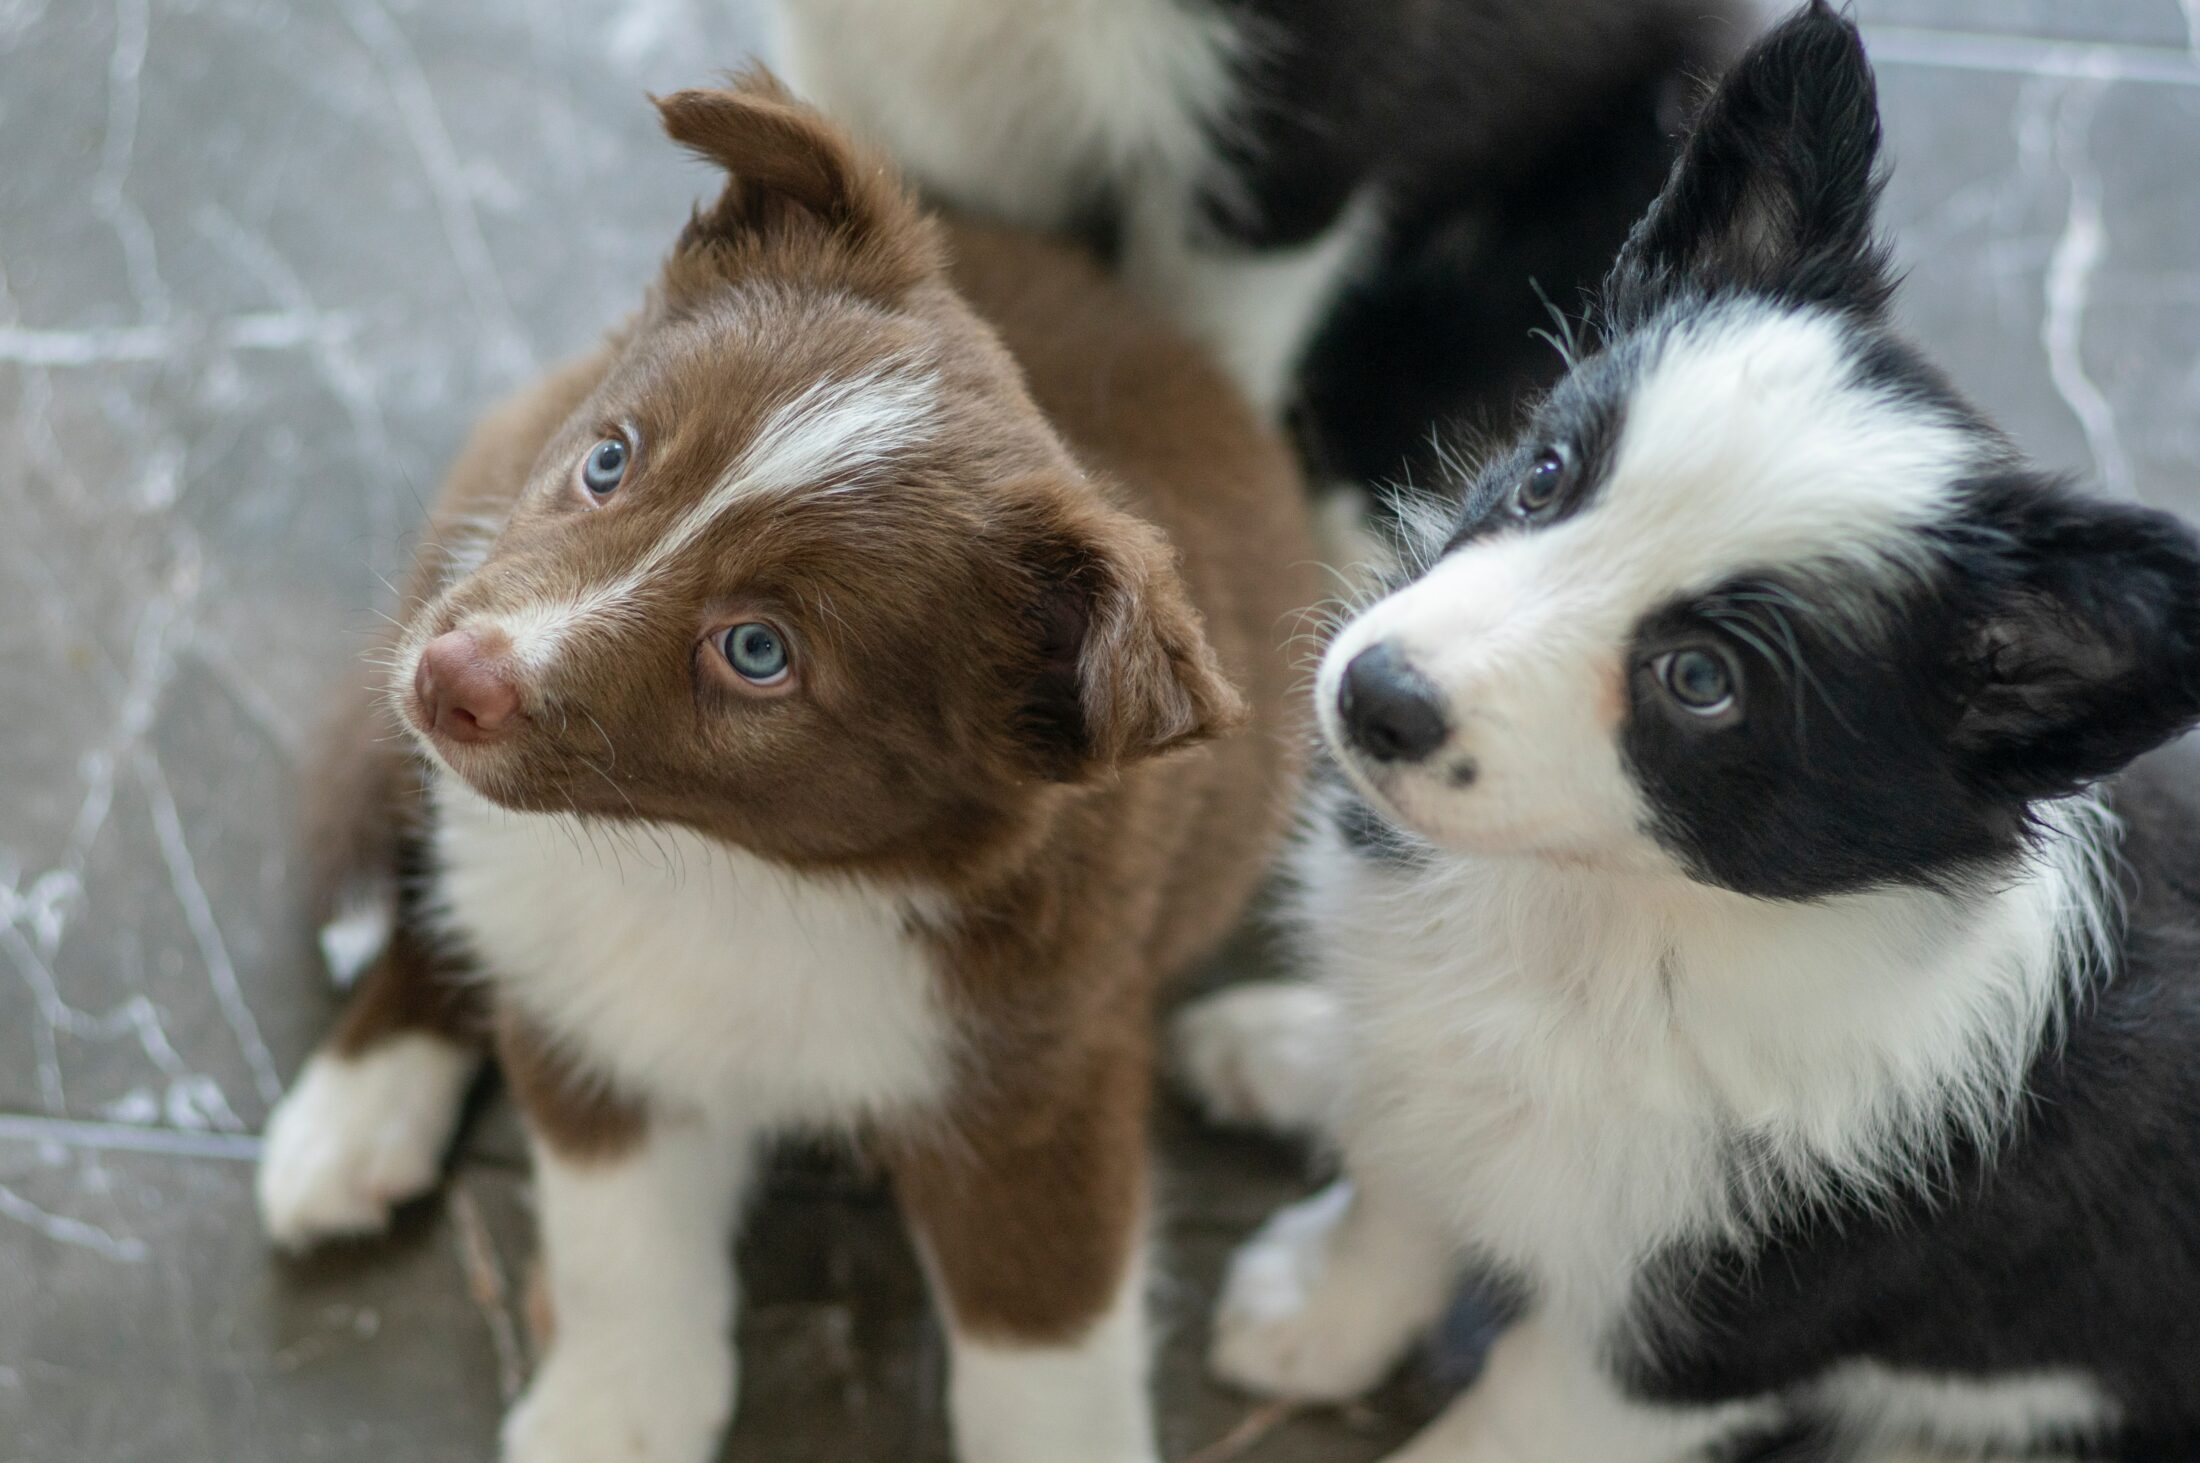 cachorro ocm olho azul - border collies